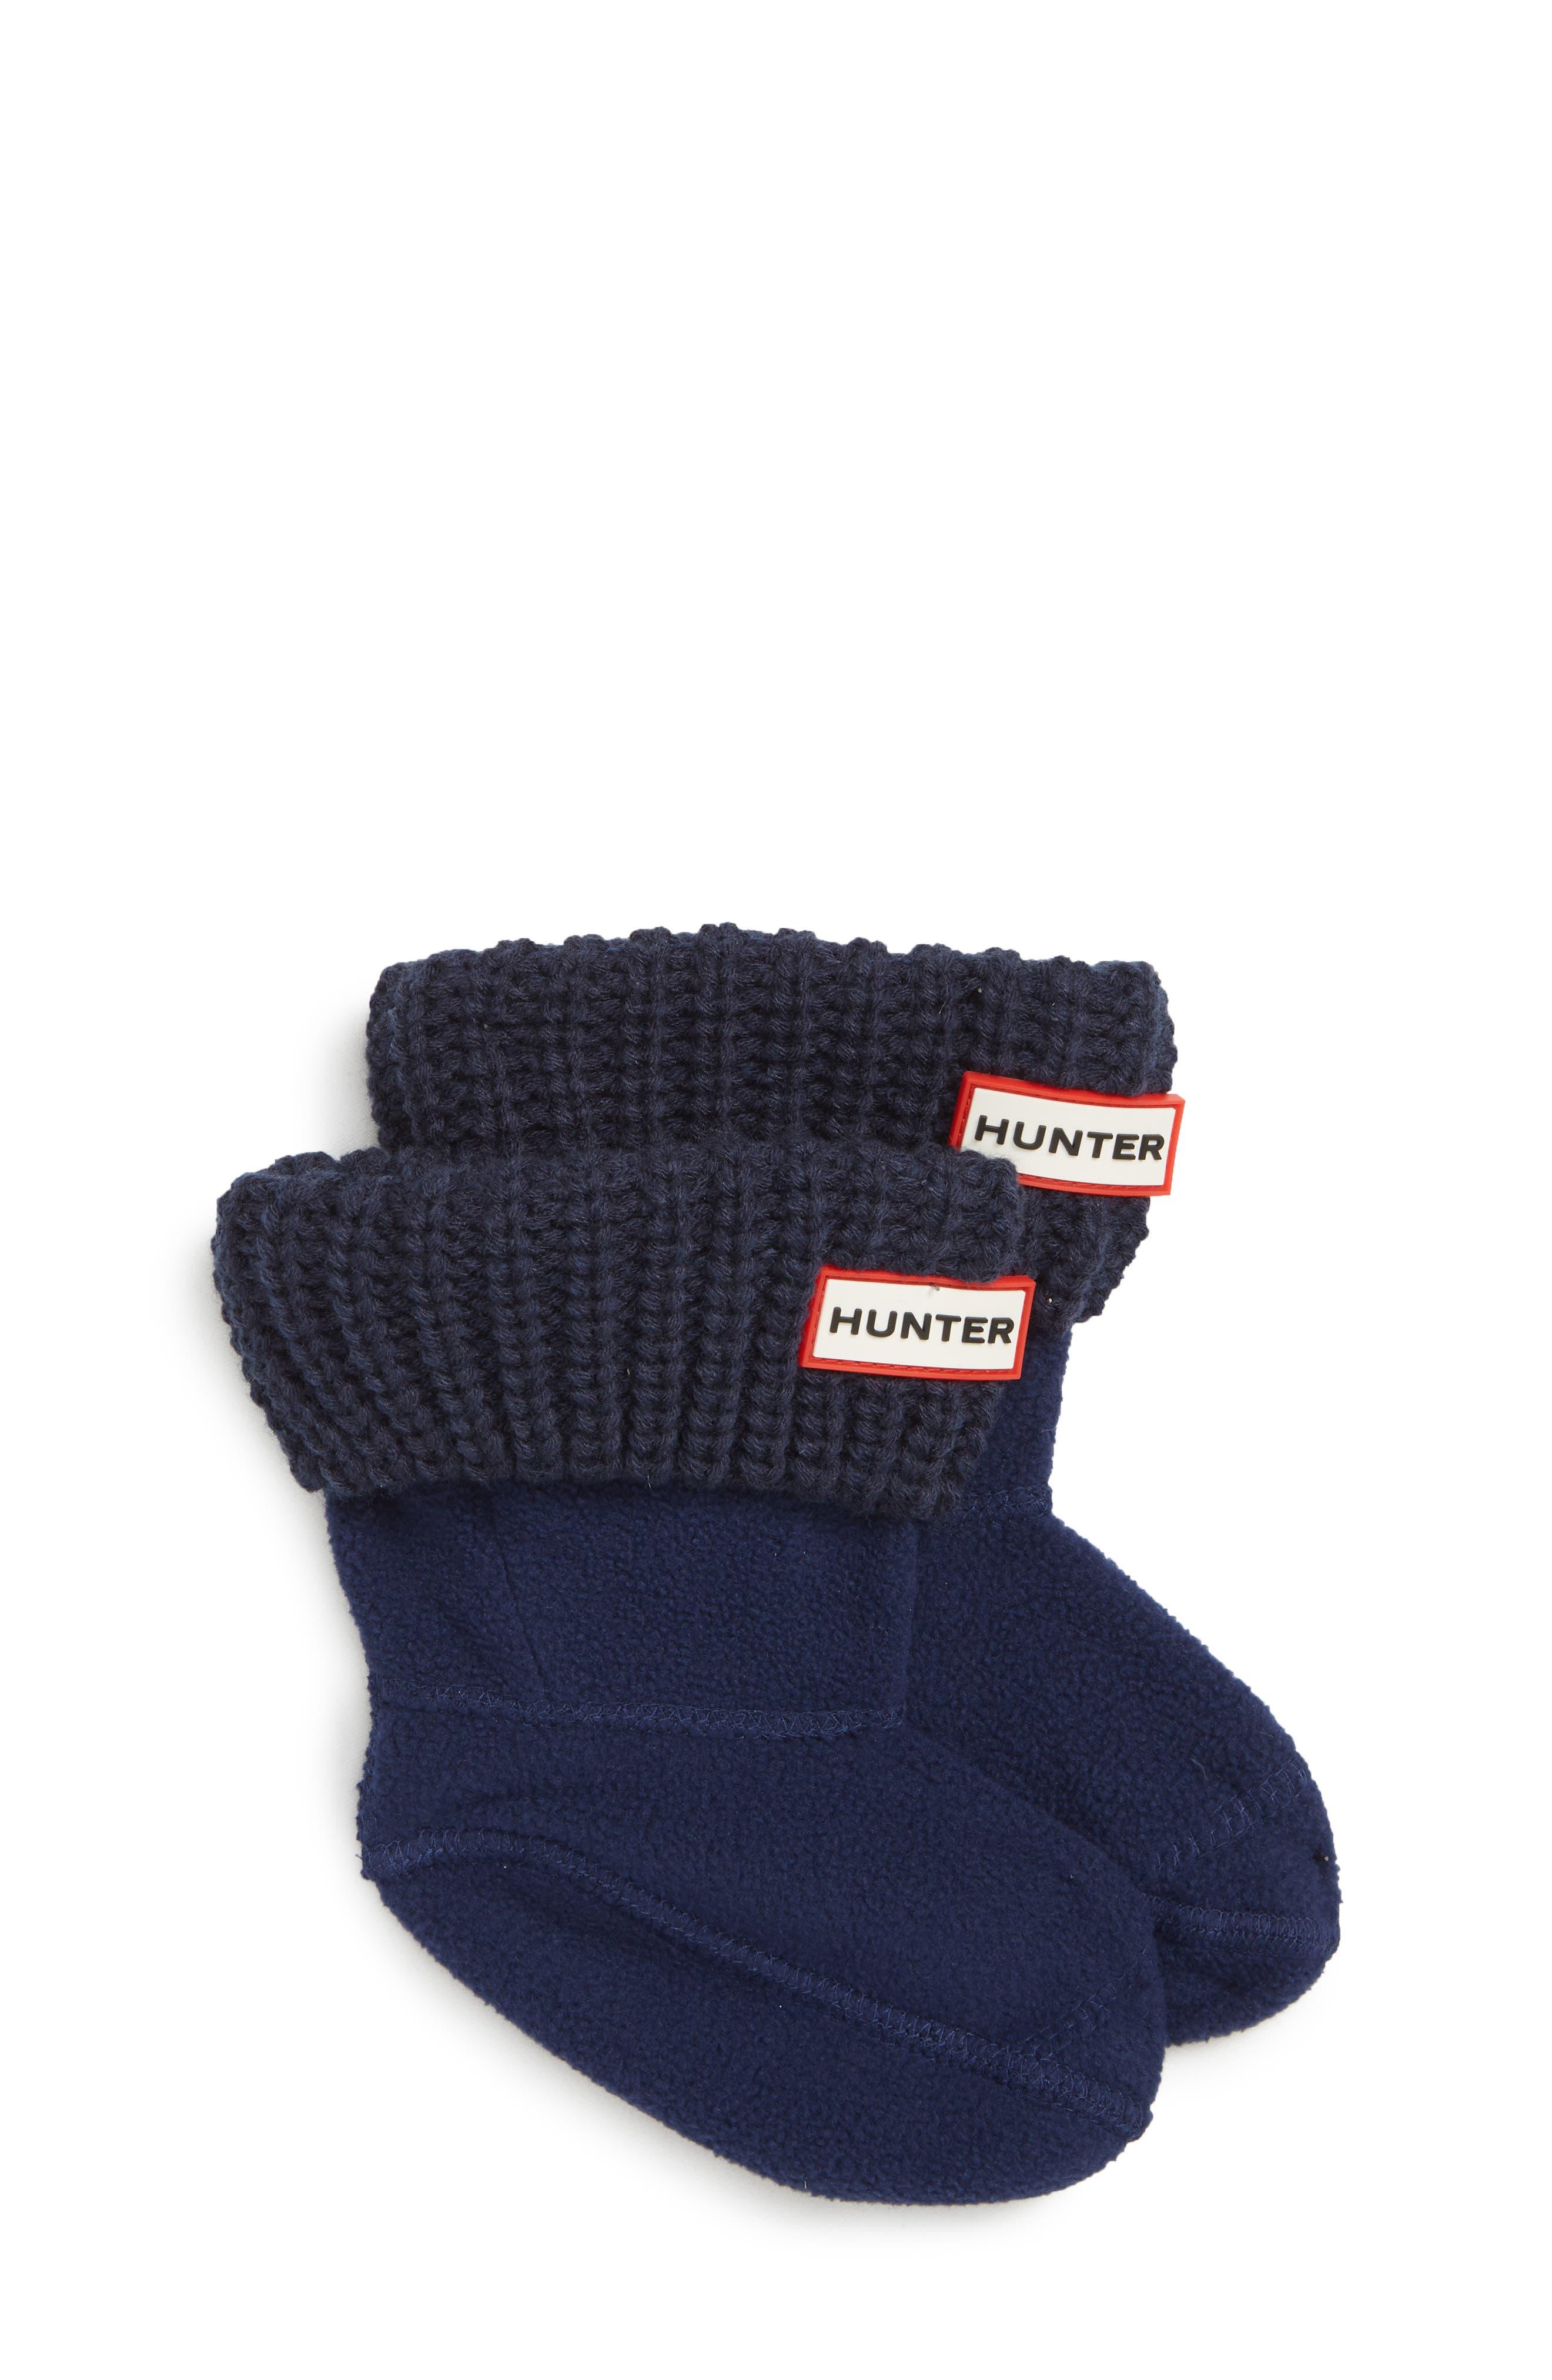 HUNTER, Cardigan Knit Cuff Welly Boot Socks, Main thumbnail 1, color, NAVY